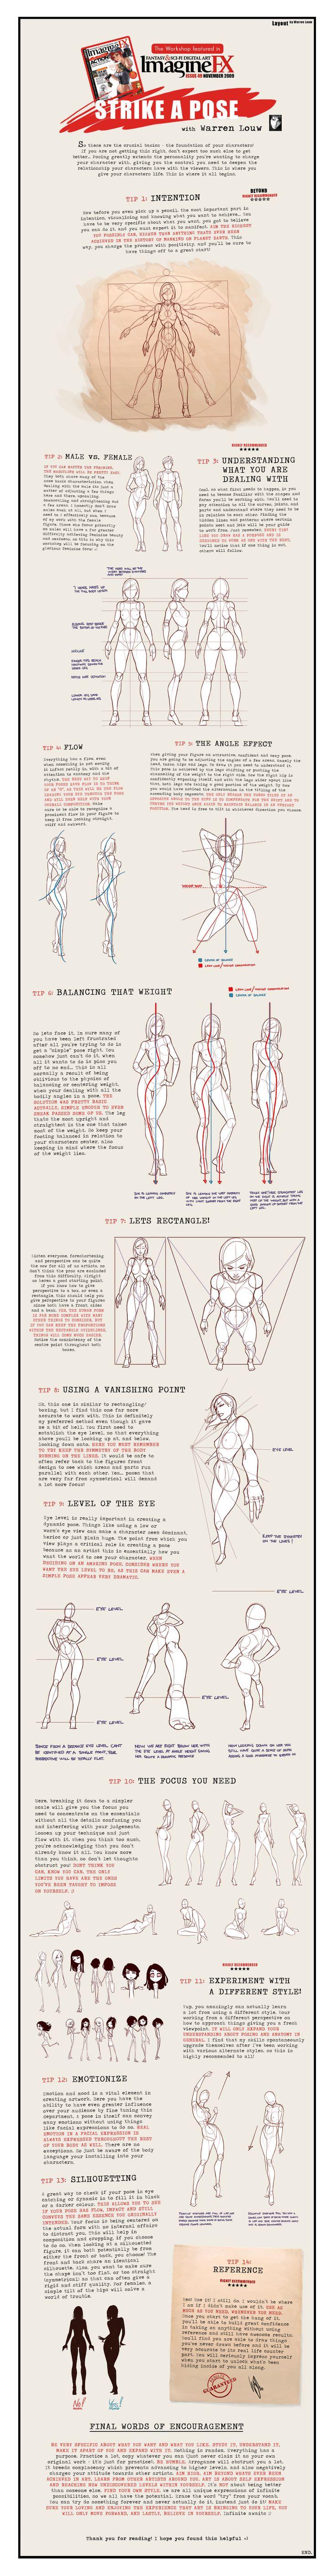 Strike a Pose. Drawing Tips. vma.